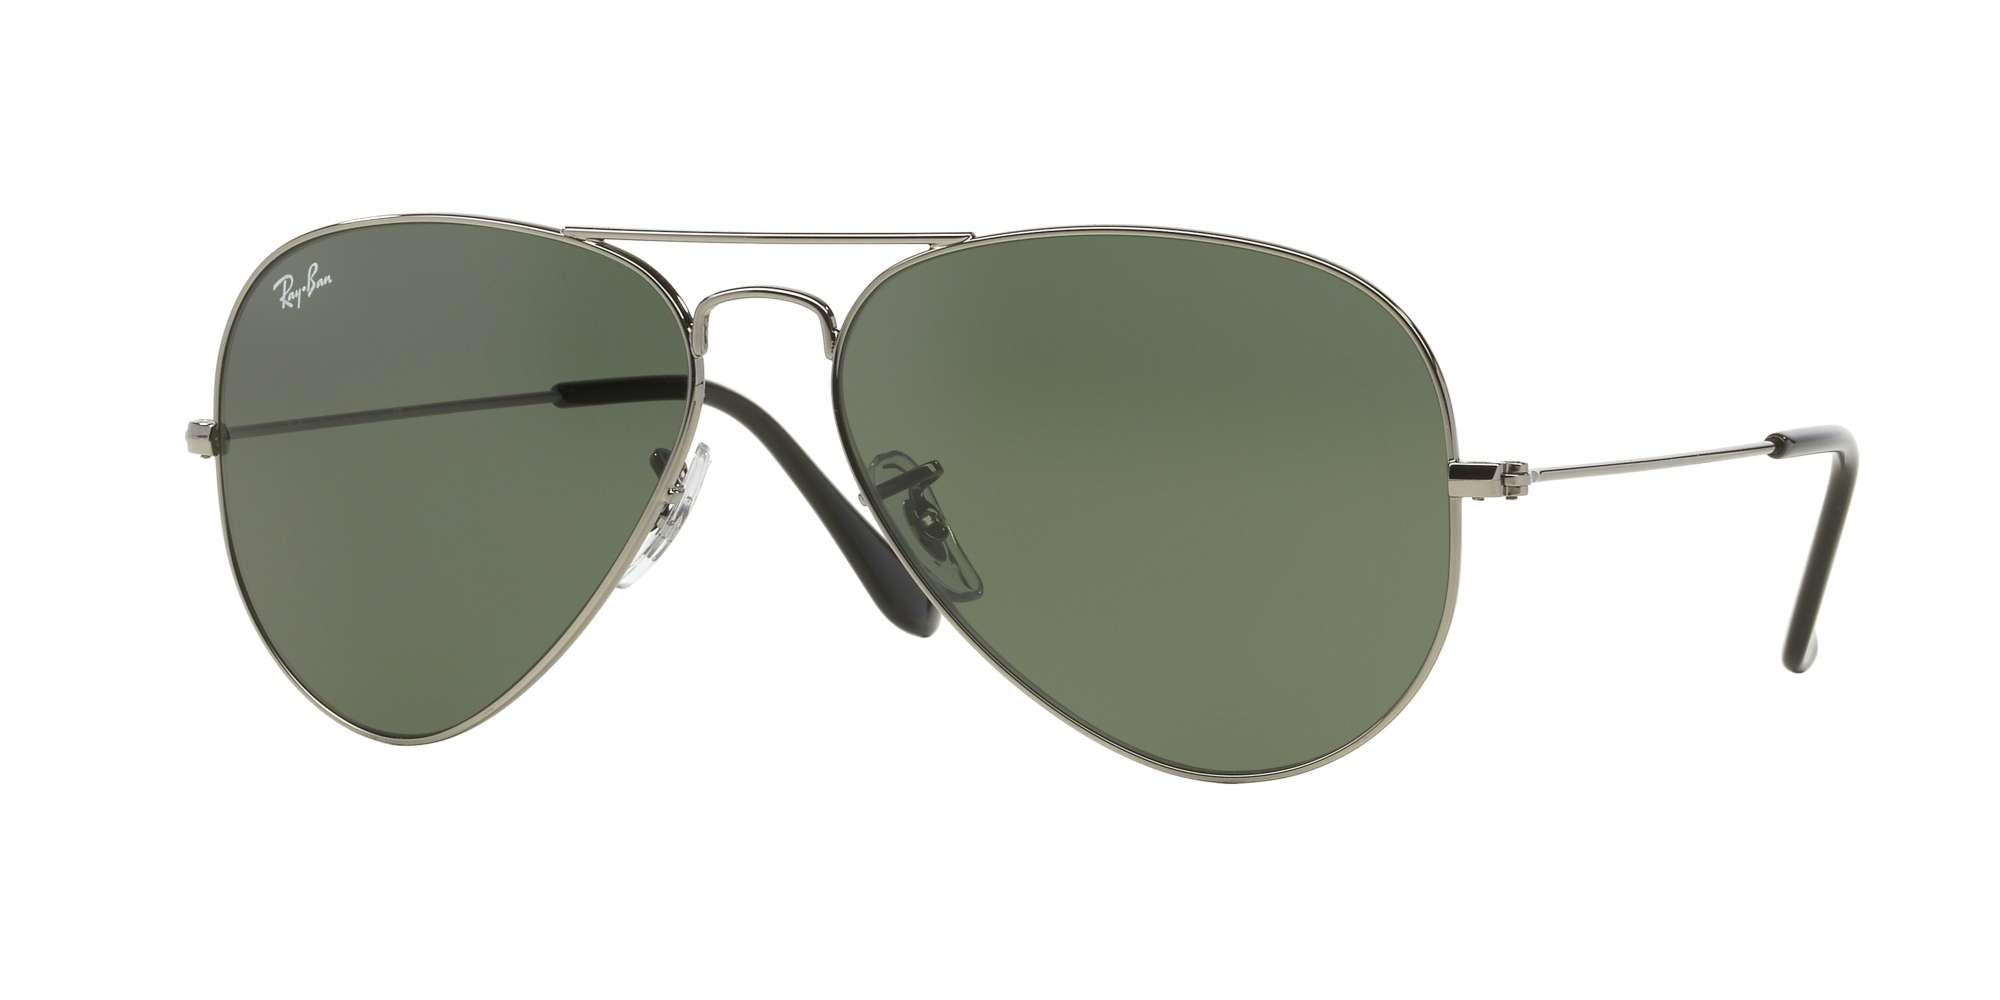 GUNMETAL / GREY GREEN lenses